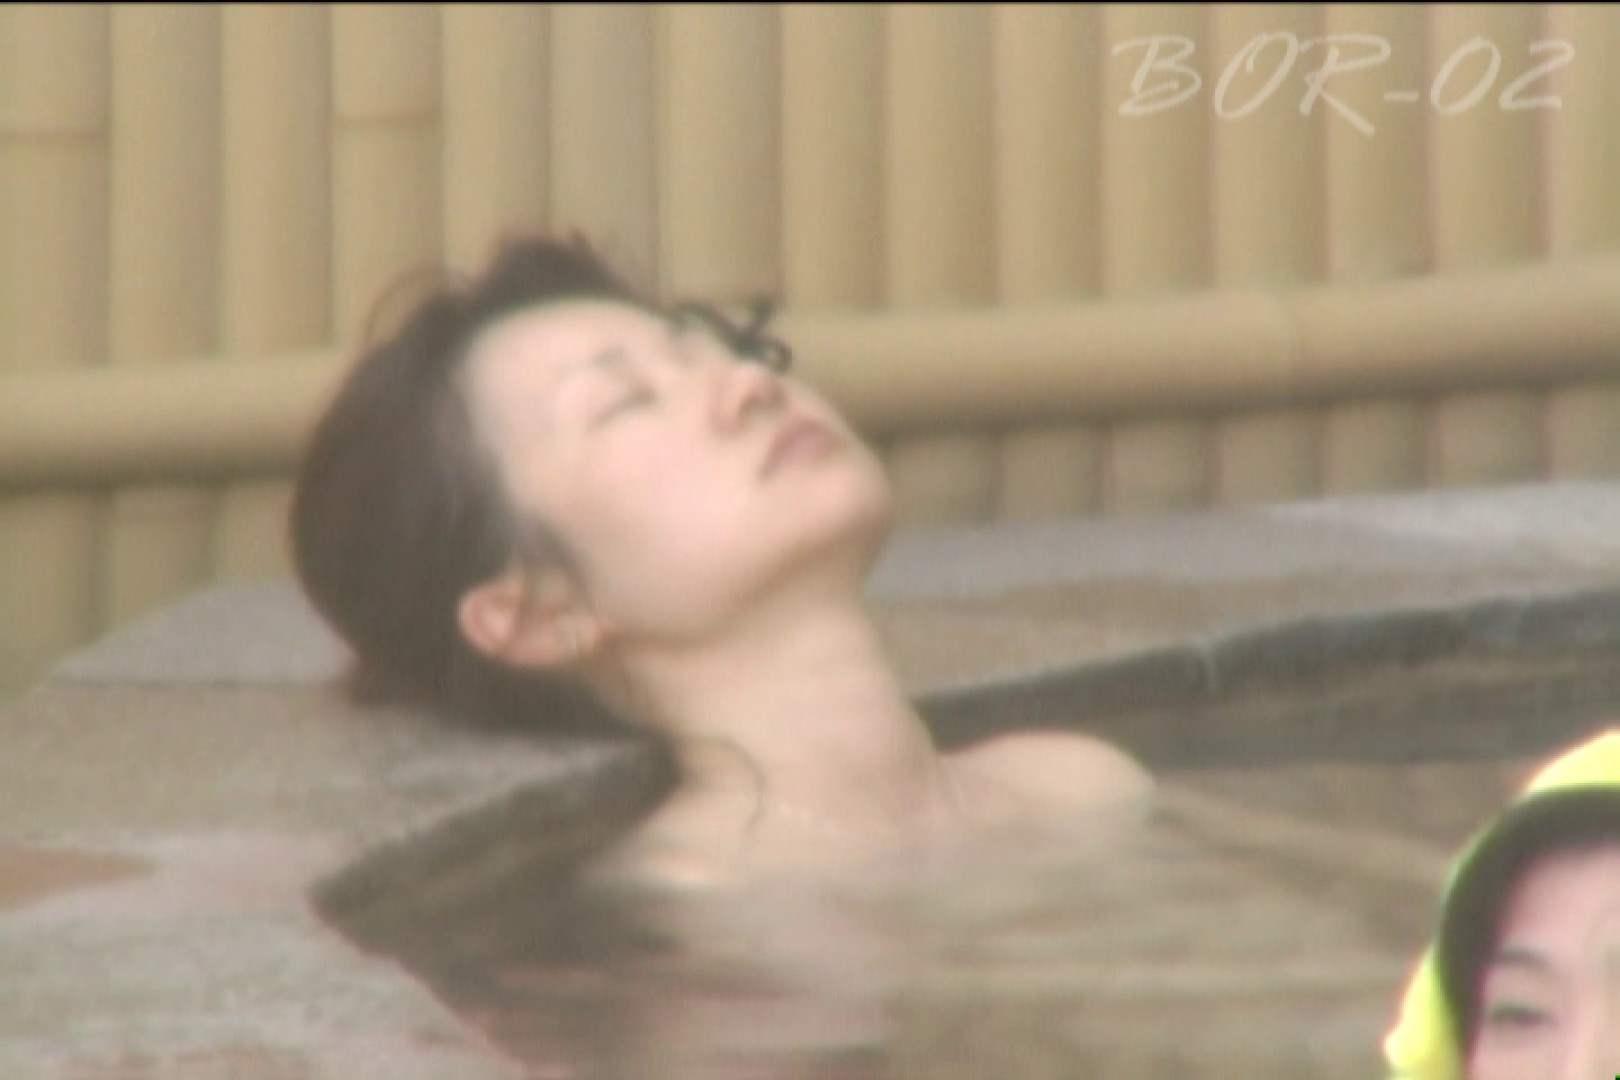 Aquaな露天風呂Vol.477 OLセックス 盗撮われめAV動画紹介 86画像 26